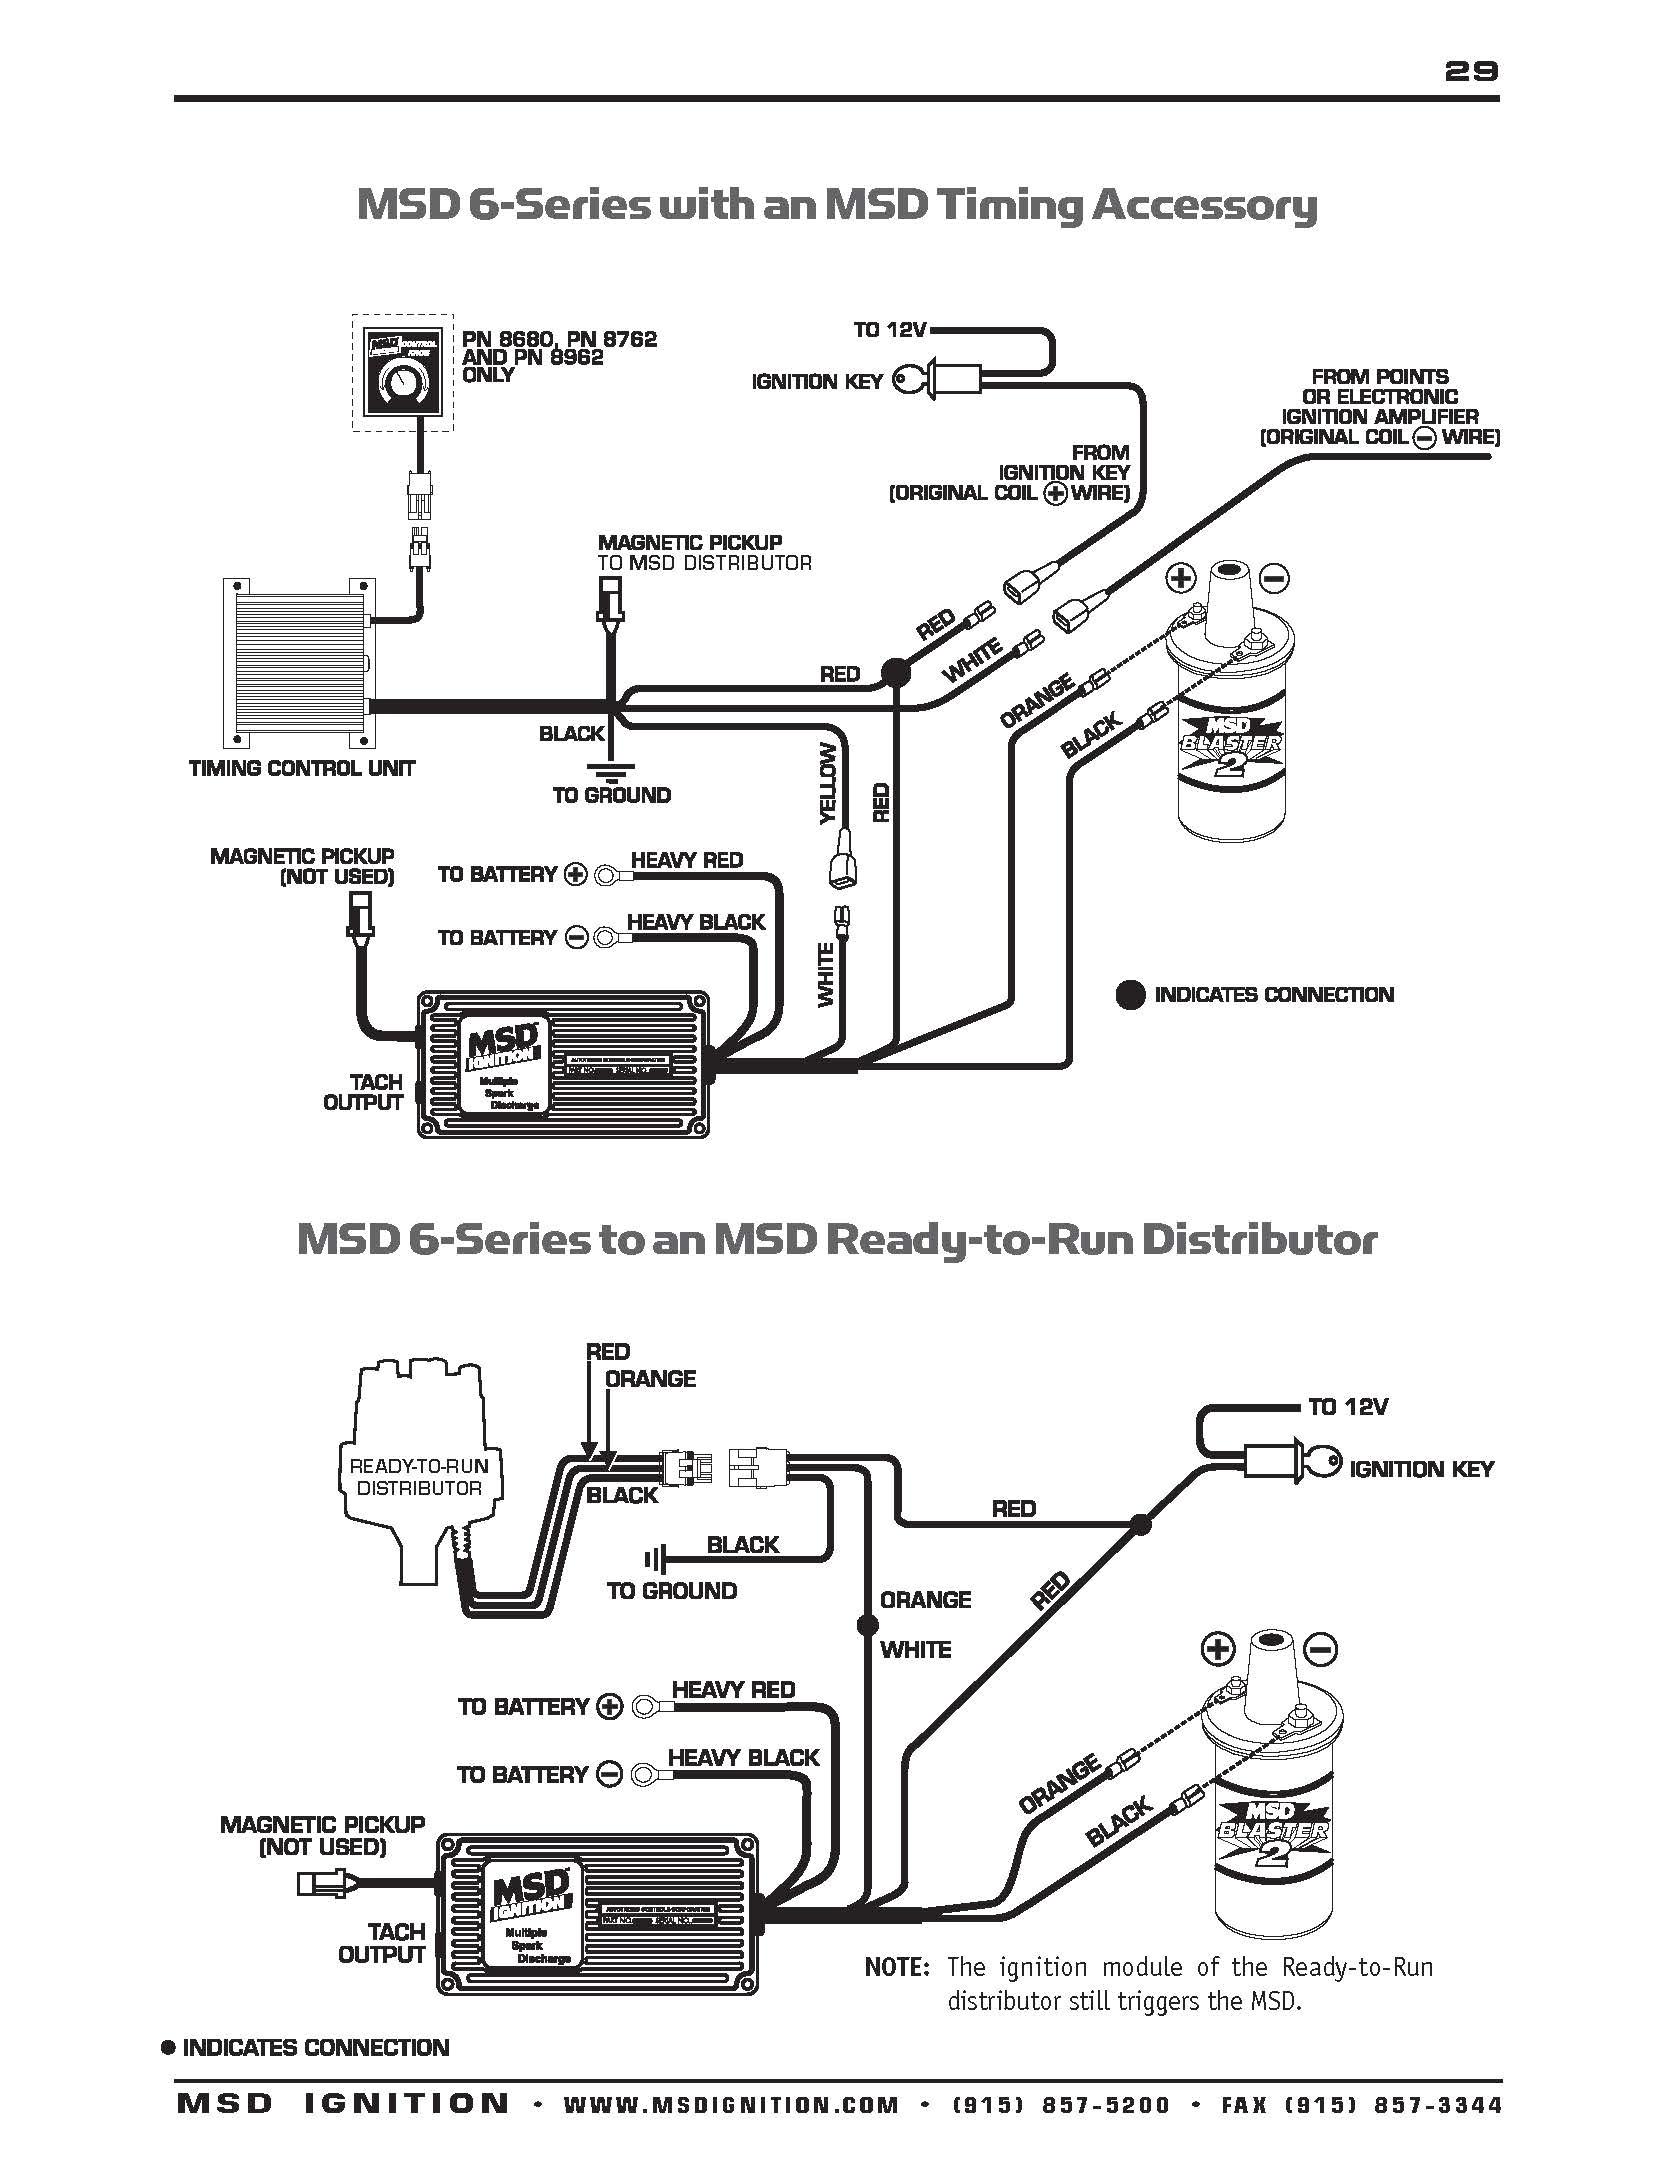 Msd 6462 Wiring Diagram Wiring Diagram Msd 6462 Wiring Diagram